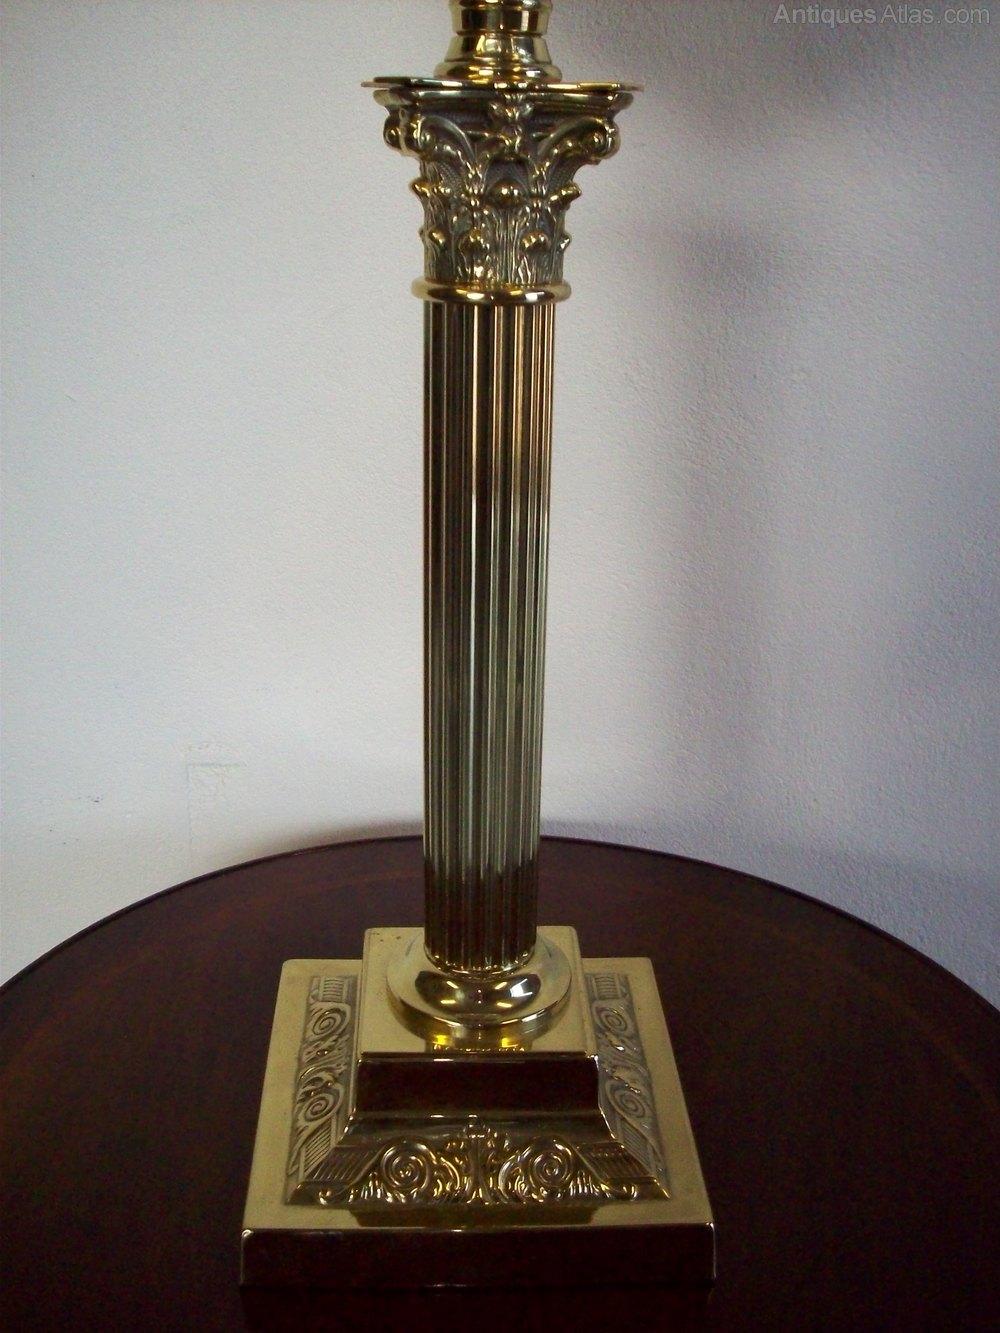 Antiques Atlas A Victorian Brass Corinthian Column Oil Lamp